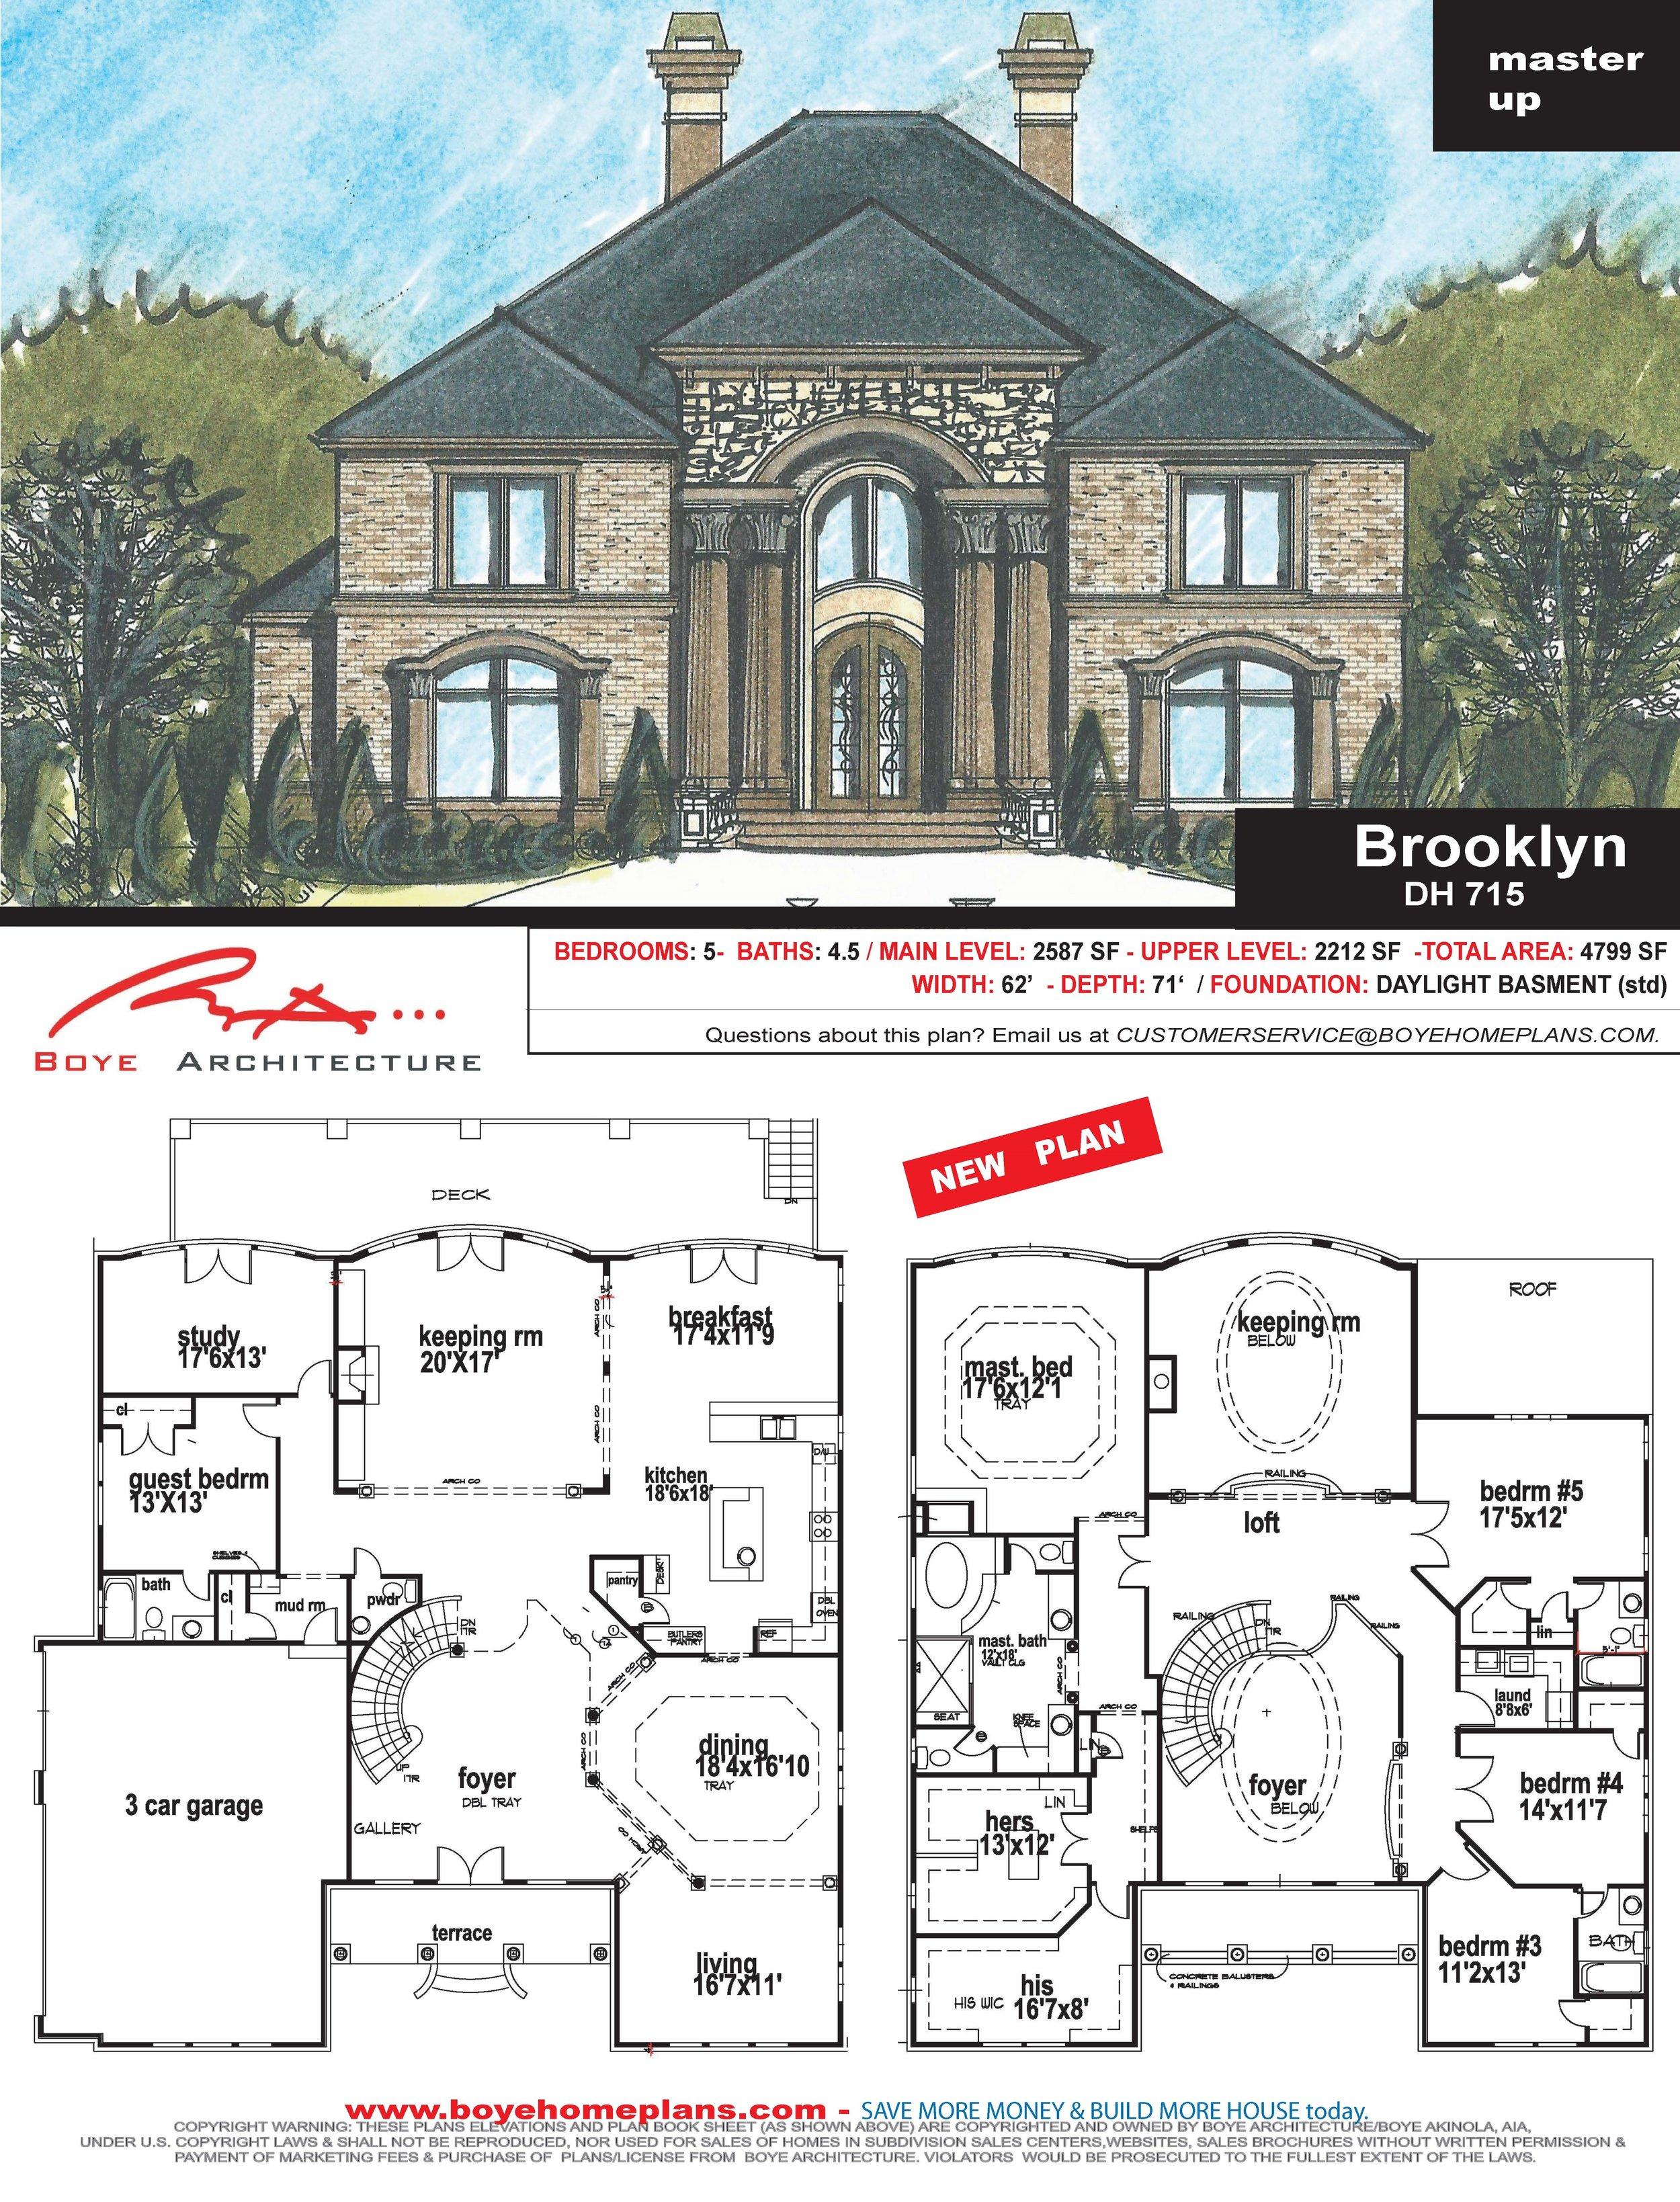 BROOKLYN PLAN PAGE-DH 715-030517.jpg